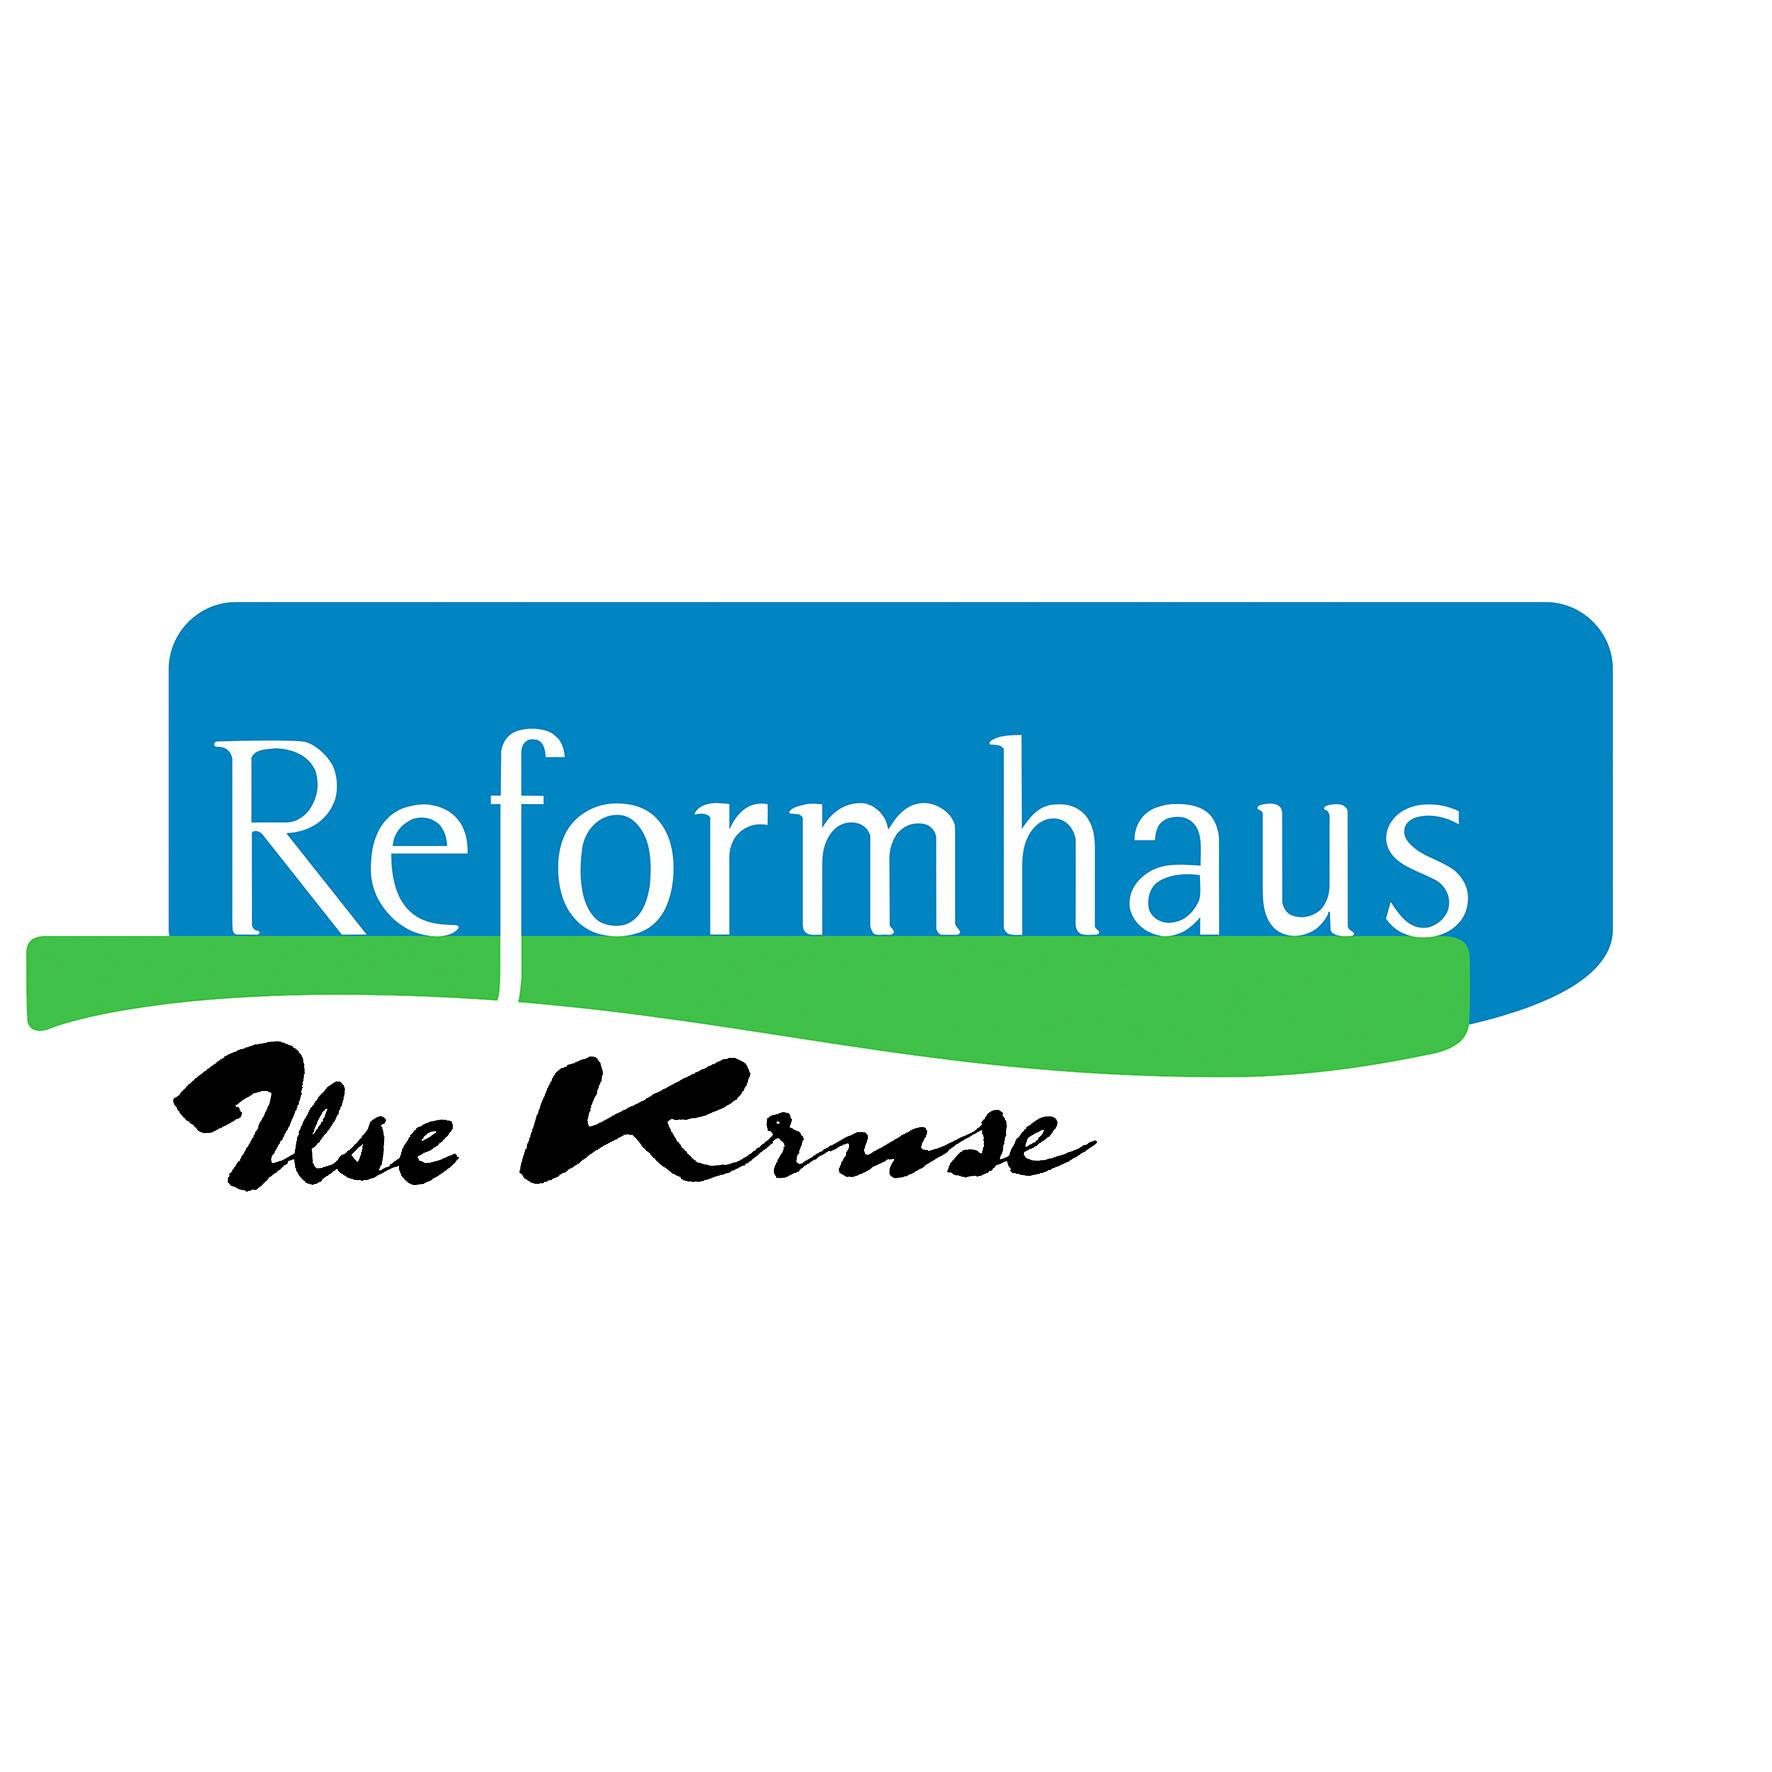 Reformhaus Ilse Kruse Nordhorn